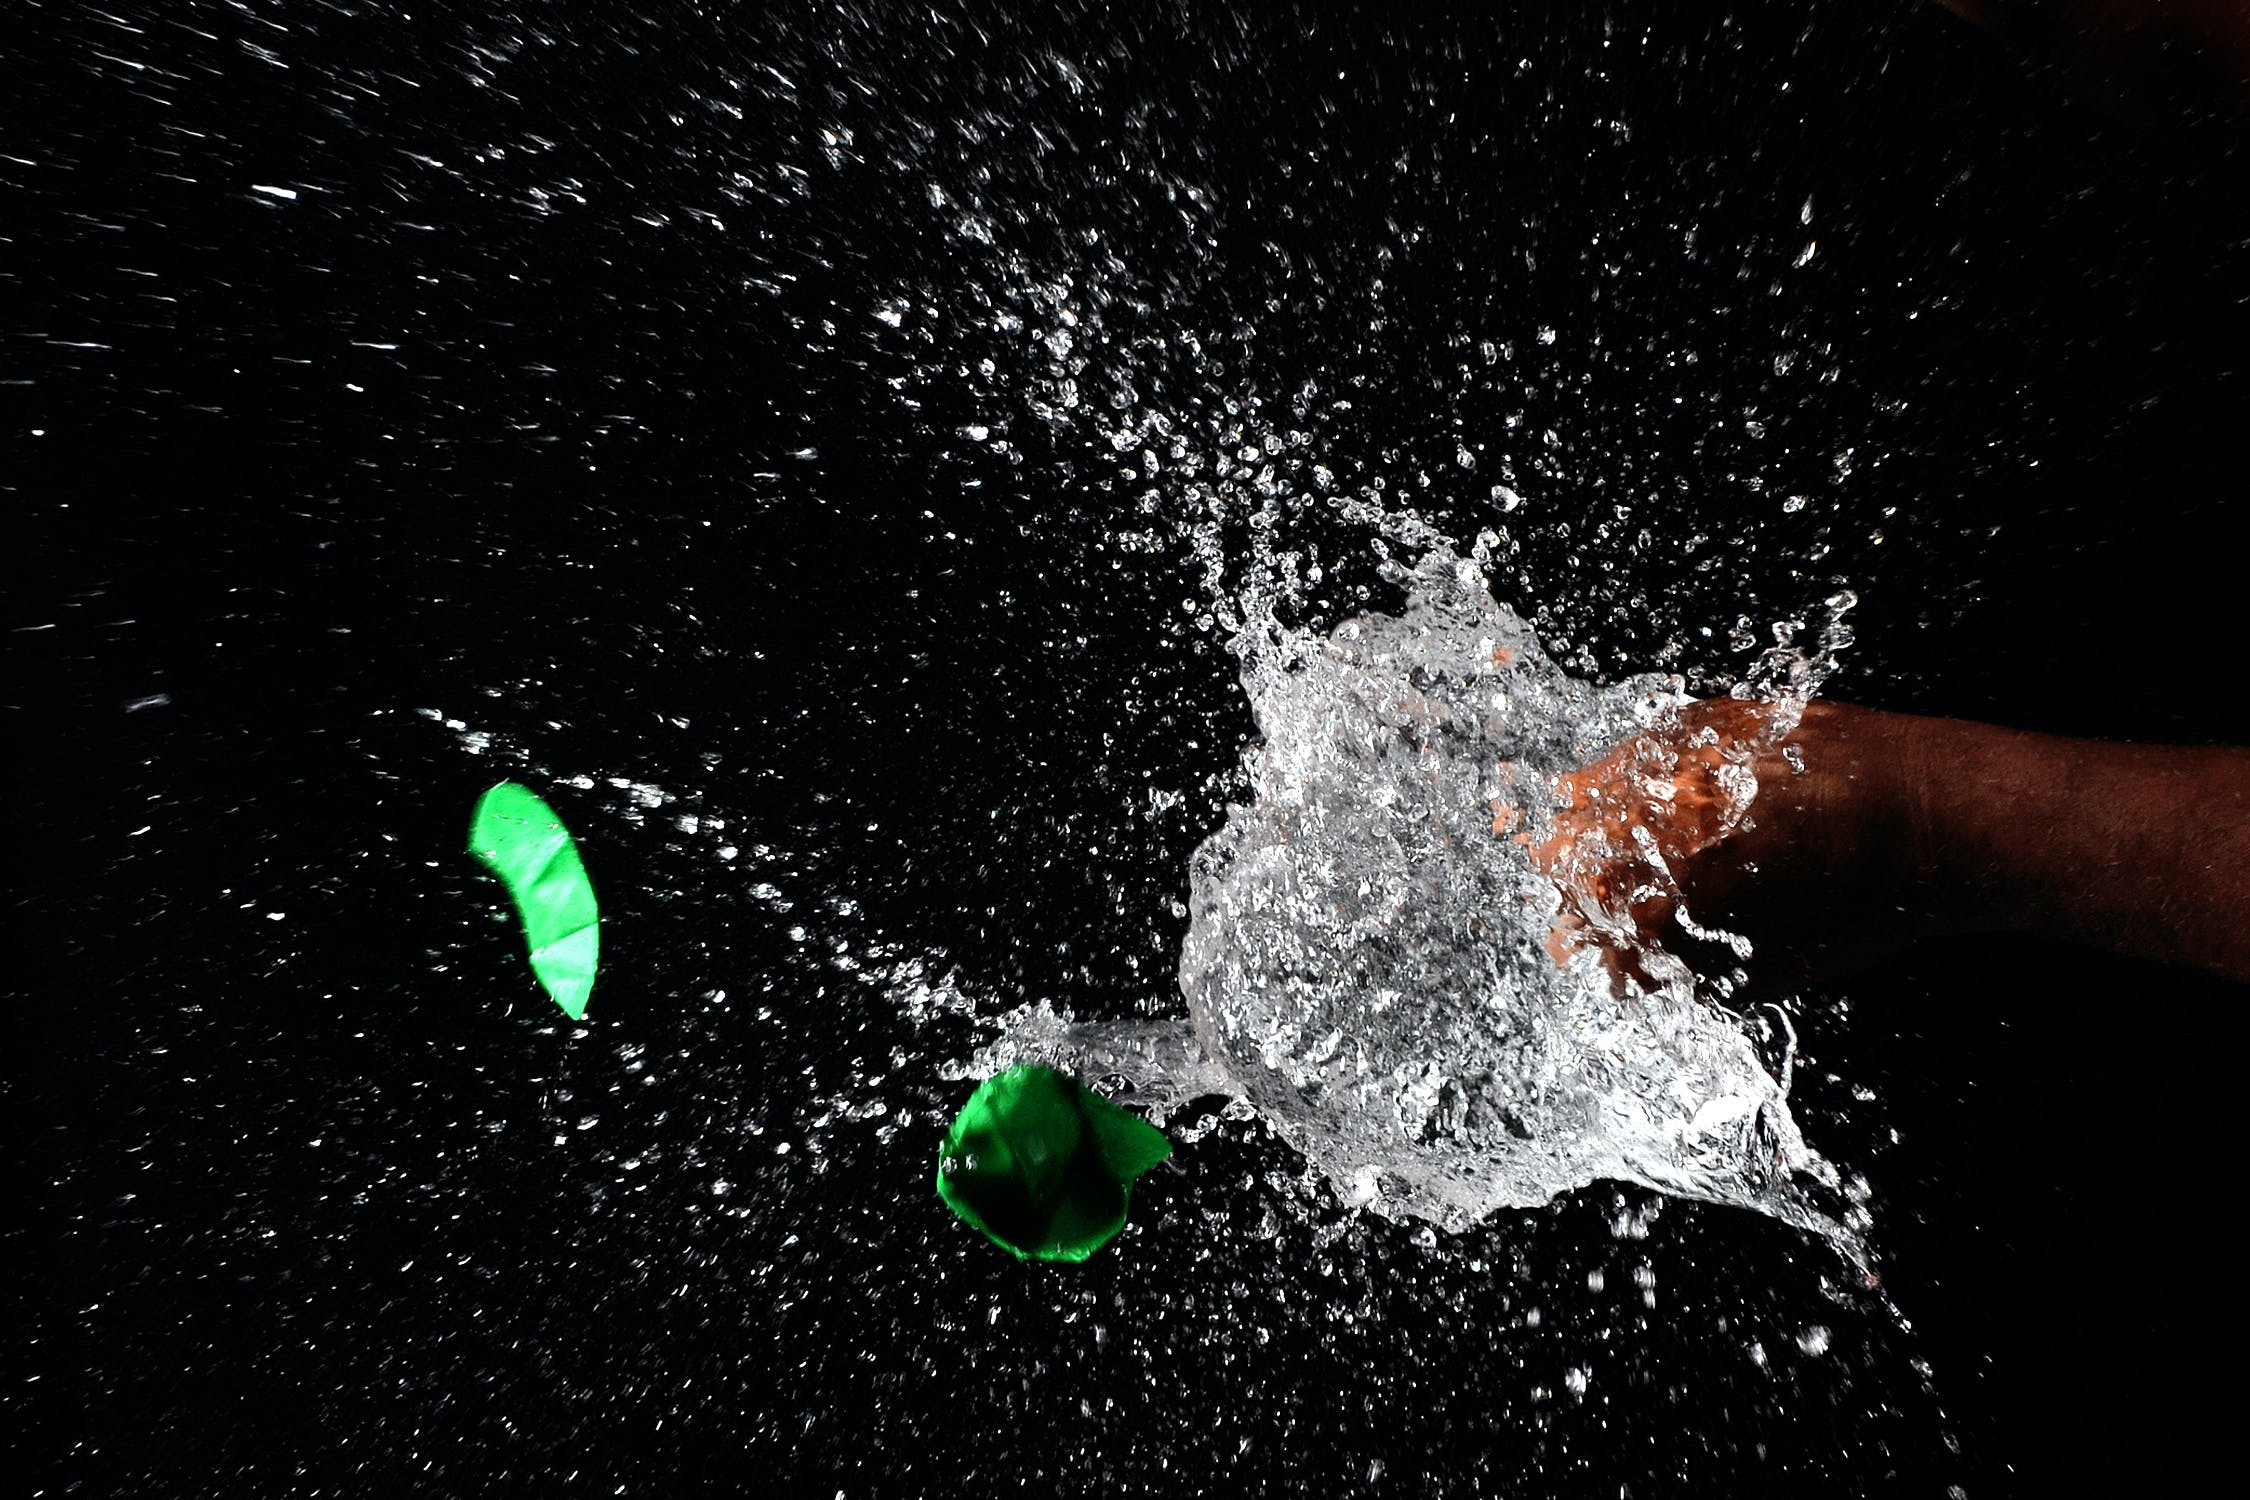 Macroshot of Water Drops